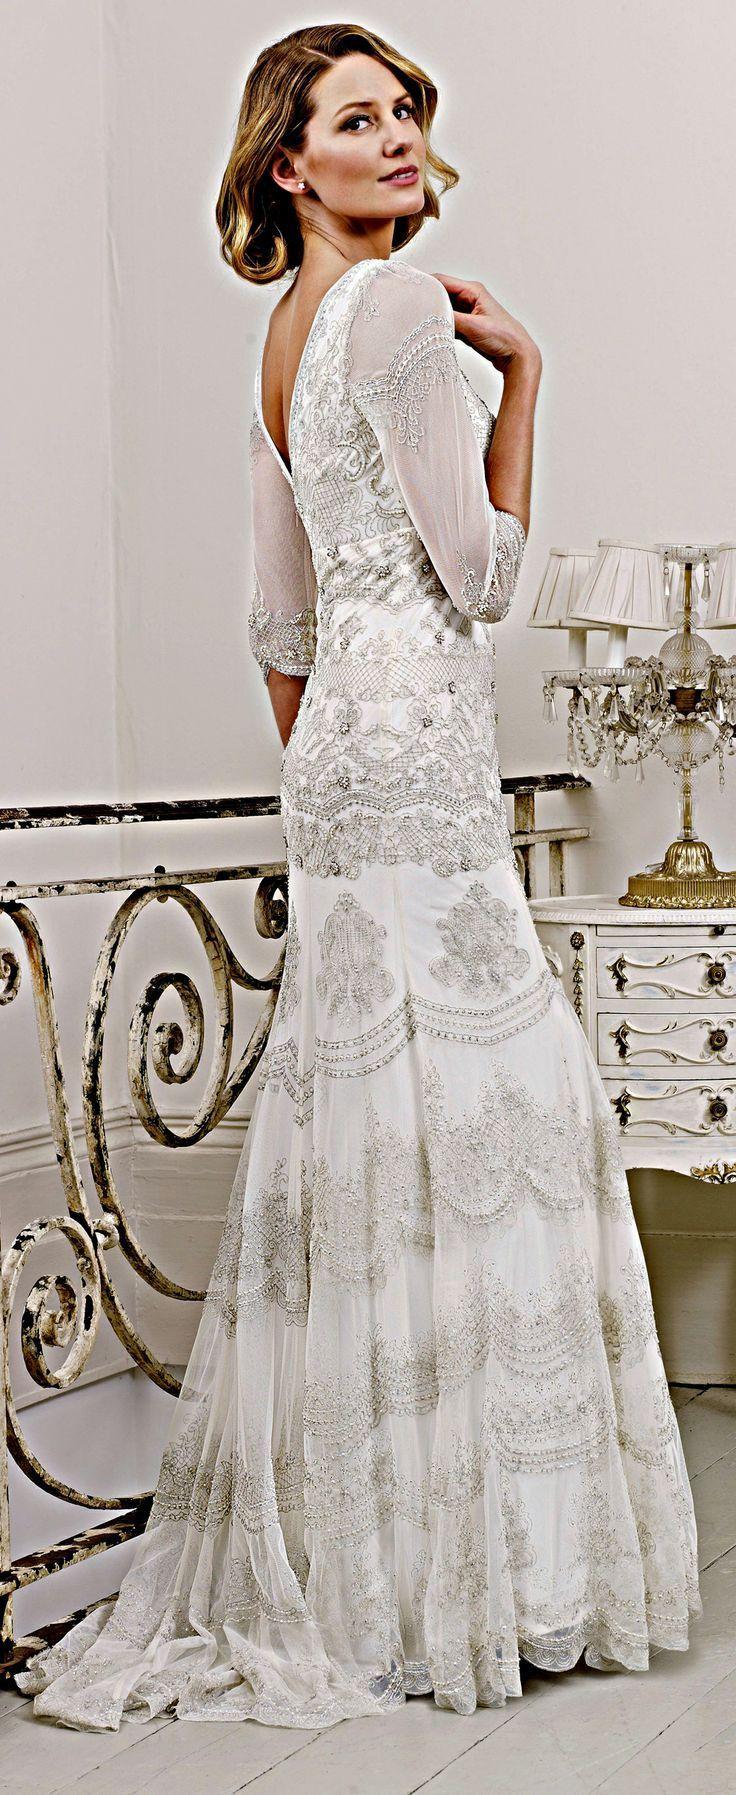 The 25+ best Mature bride dresses ideas on Pinterest | Mature ...